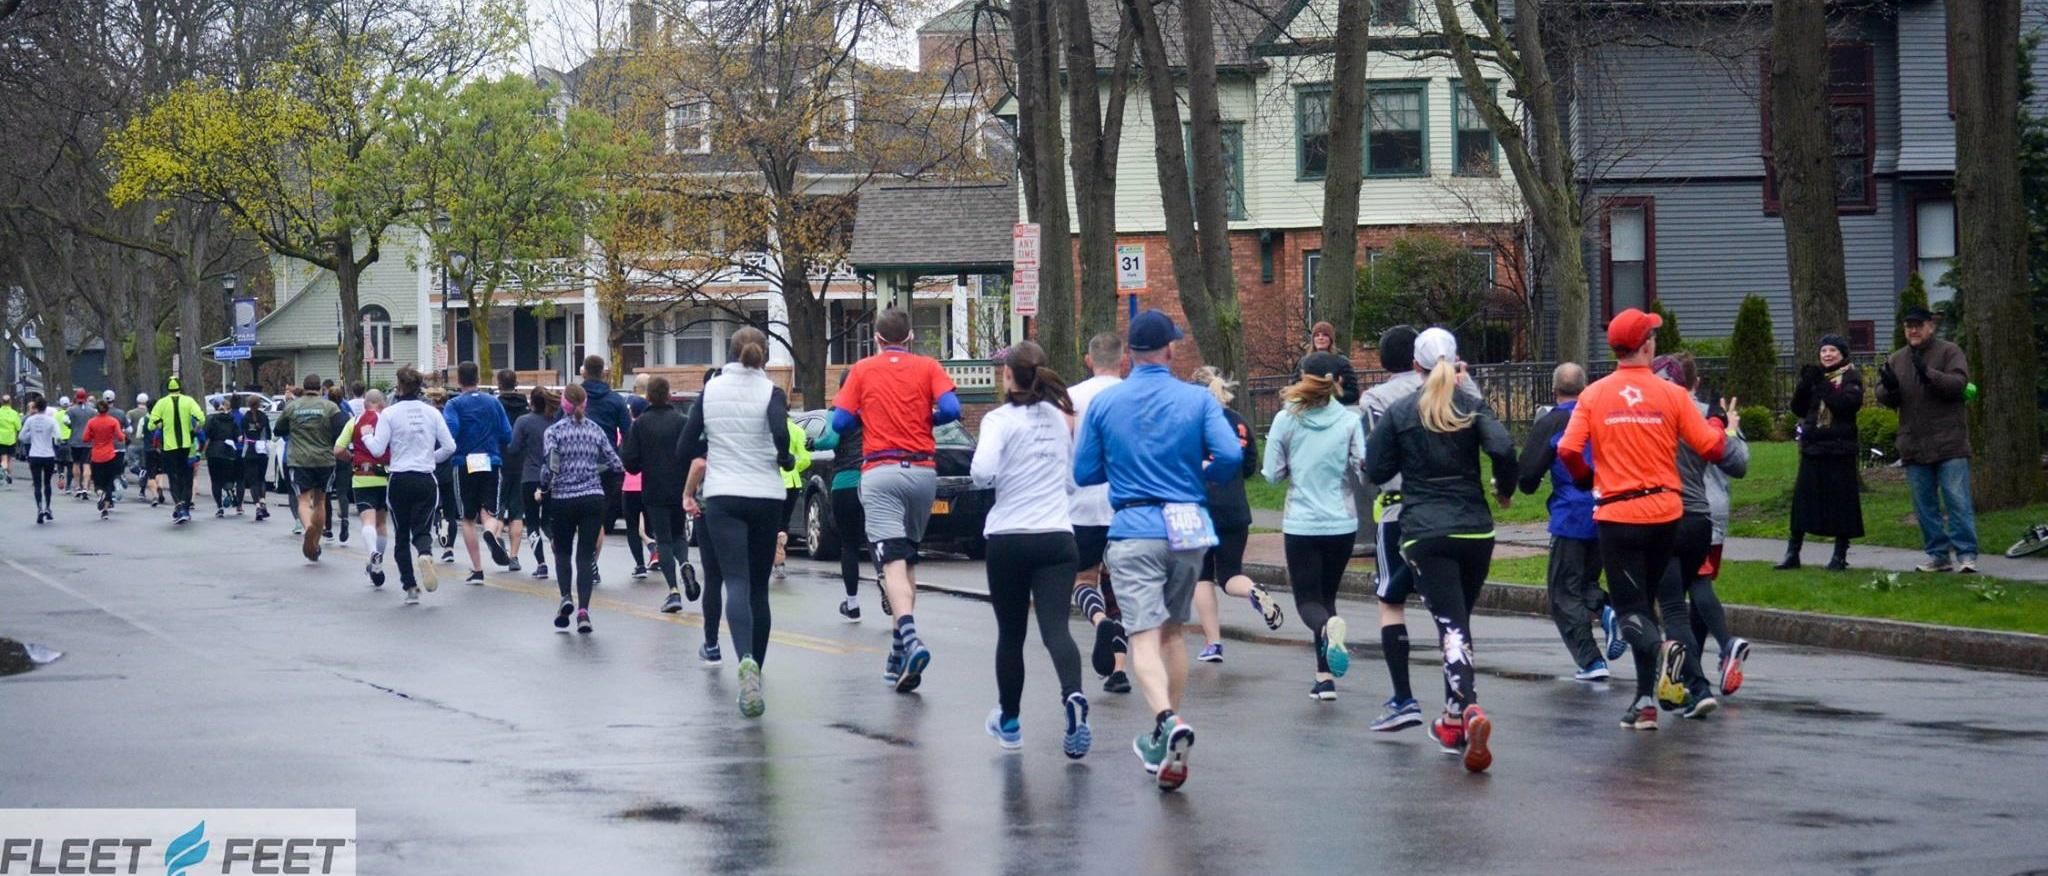 Running down Park Ave